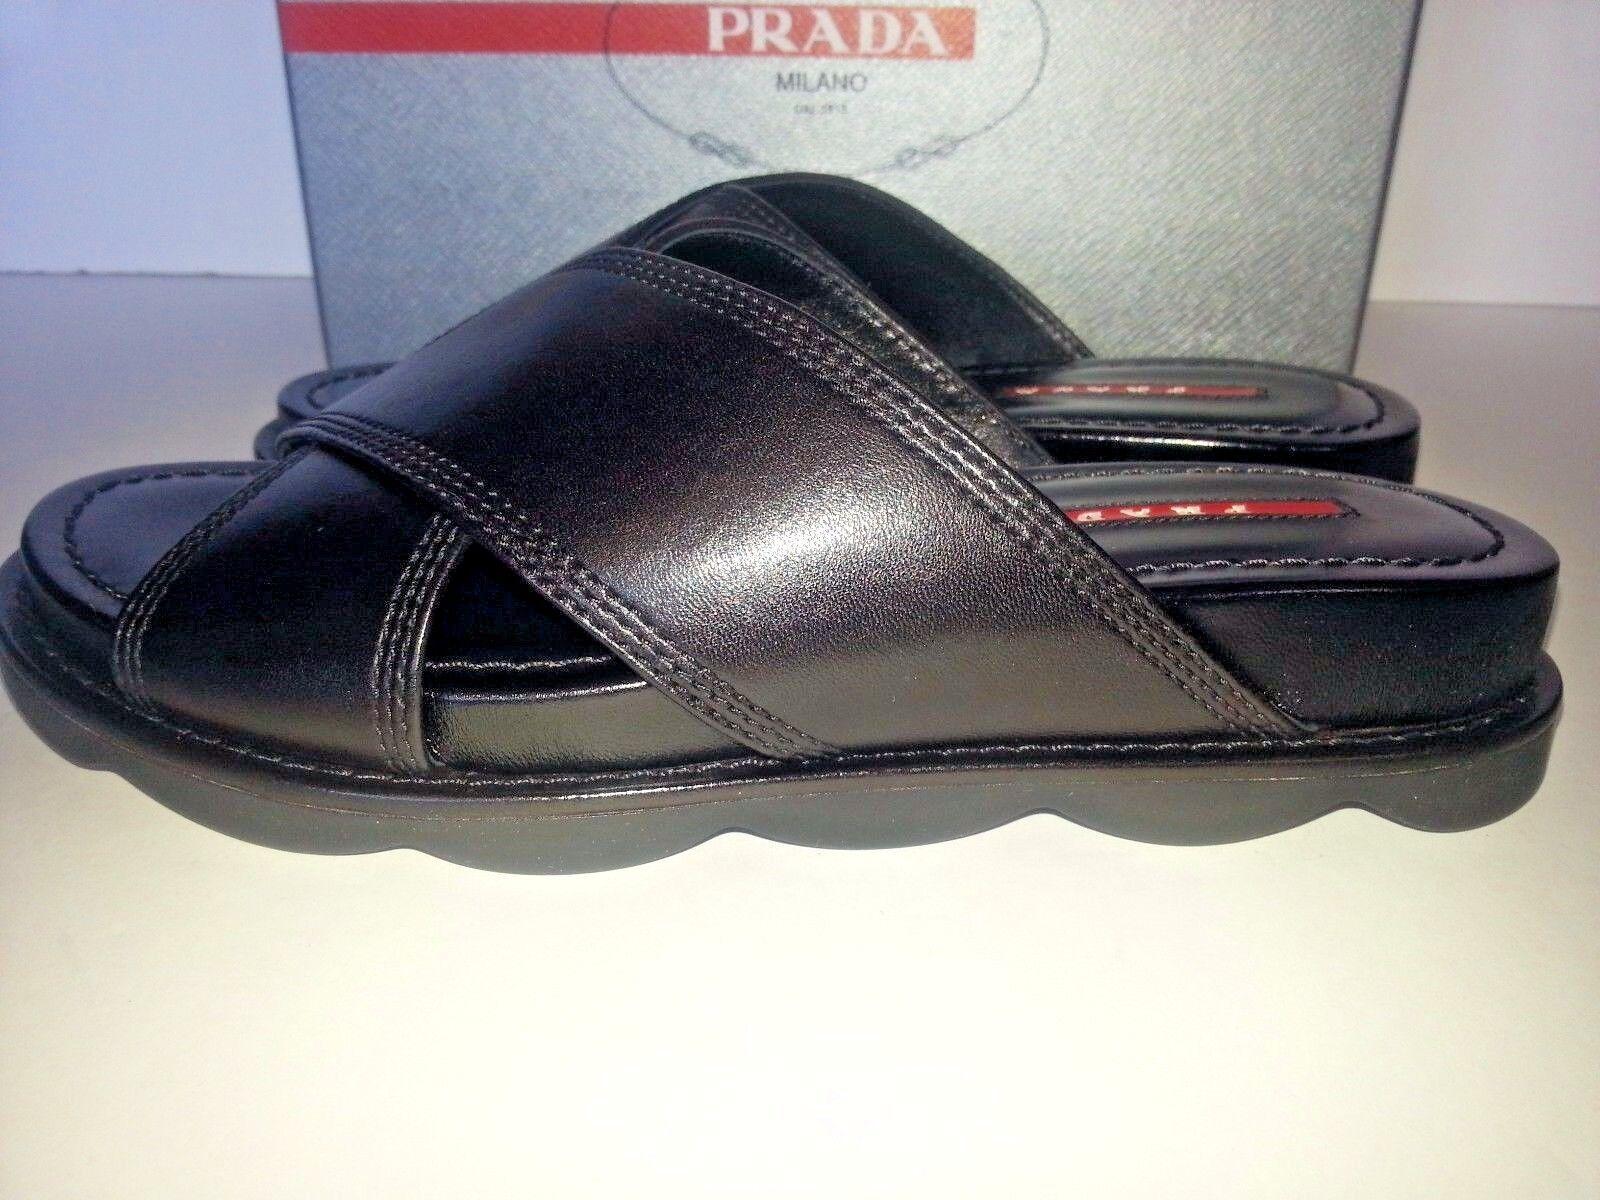 NEW Prada Linea Rossa Crisscross Leather Slide Flat Sandals Sandals Sandals Black 36.5 66add4